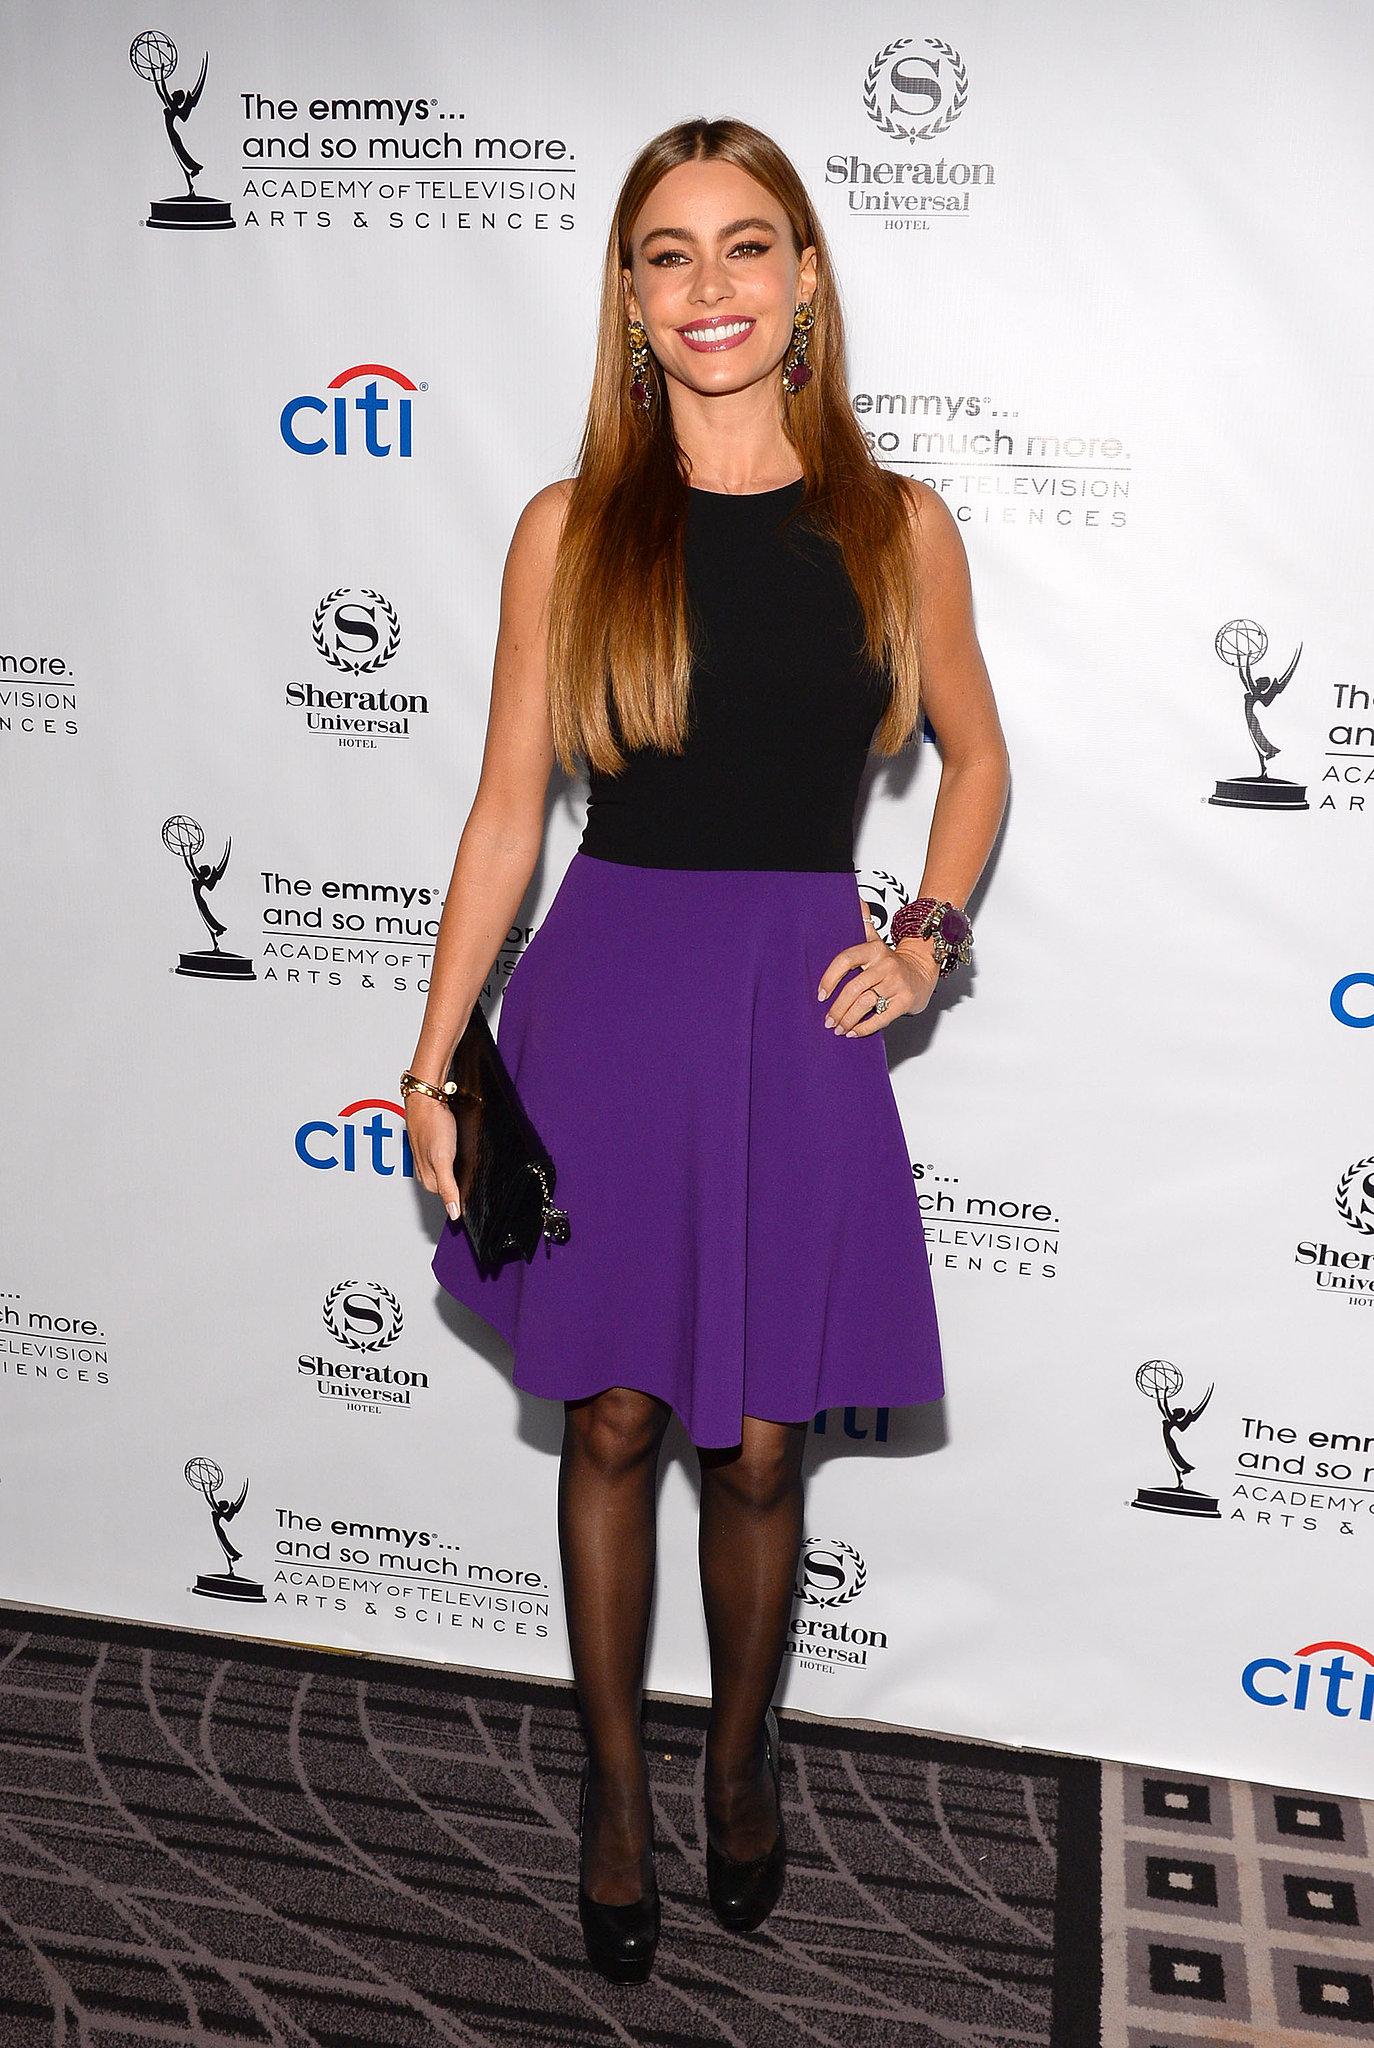 Sofia Vergara wore a black and purple dress.